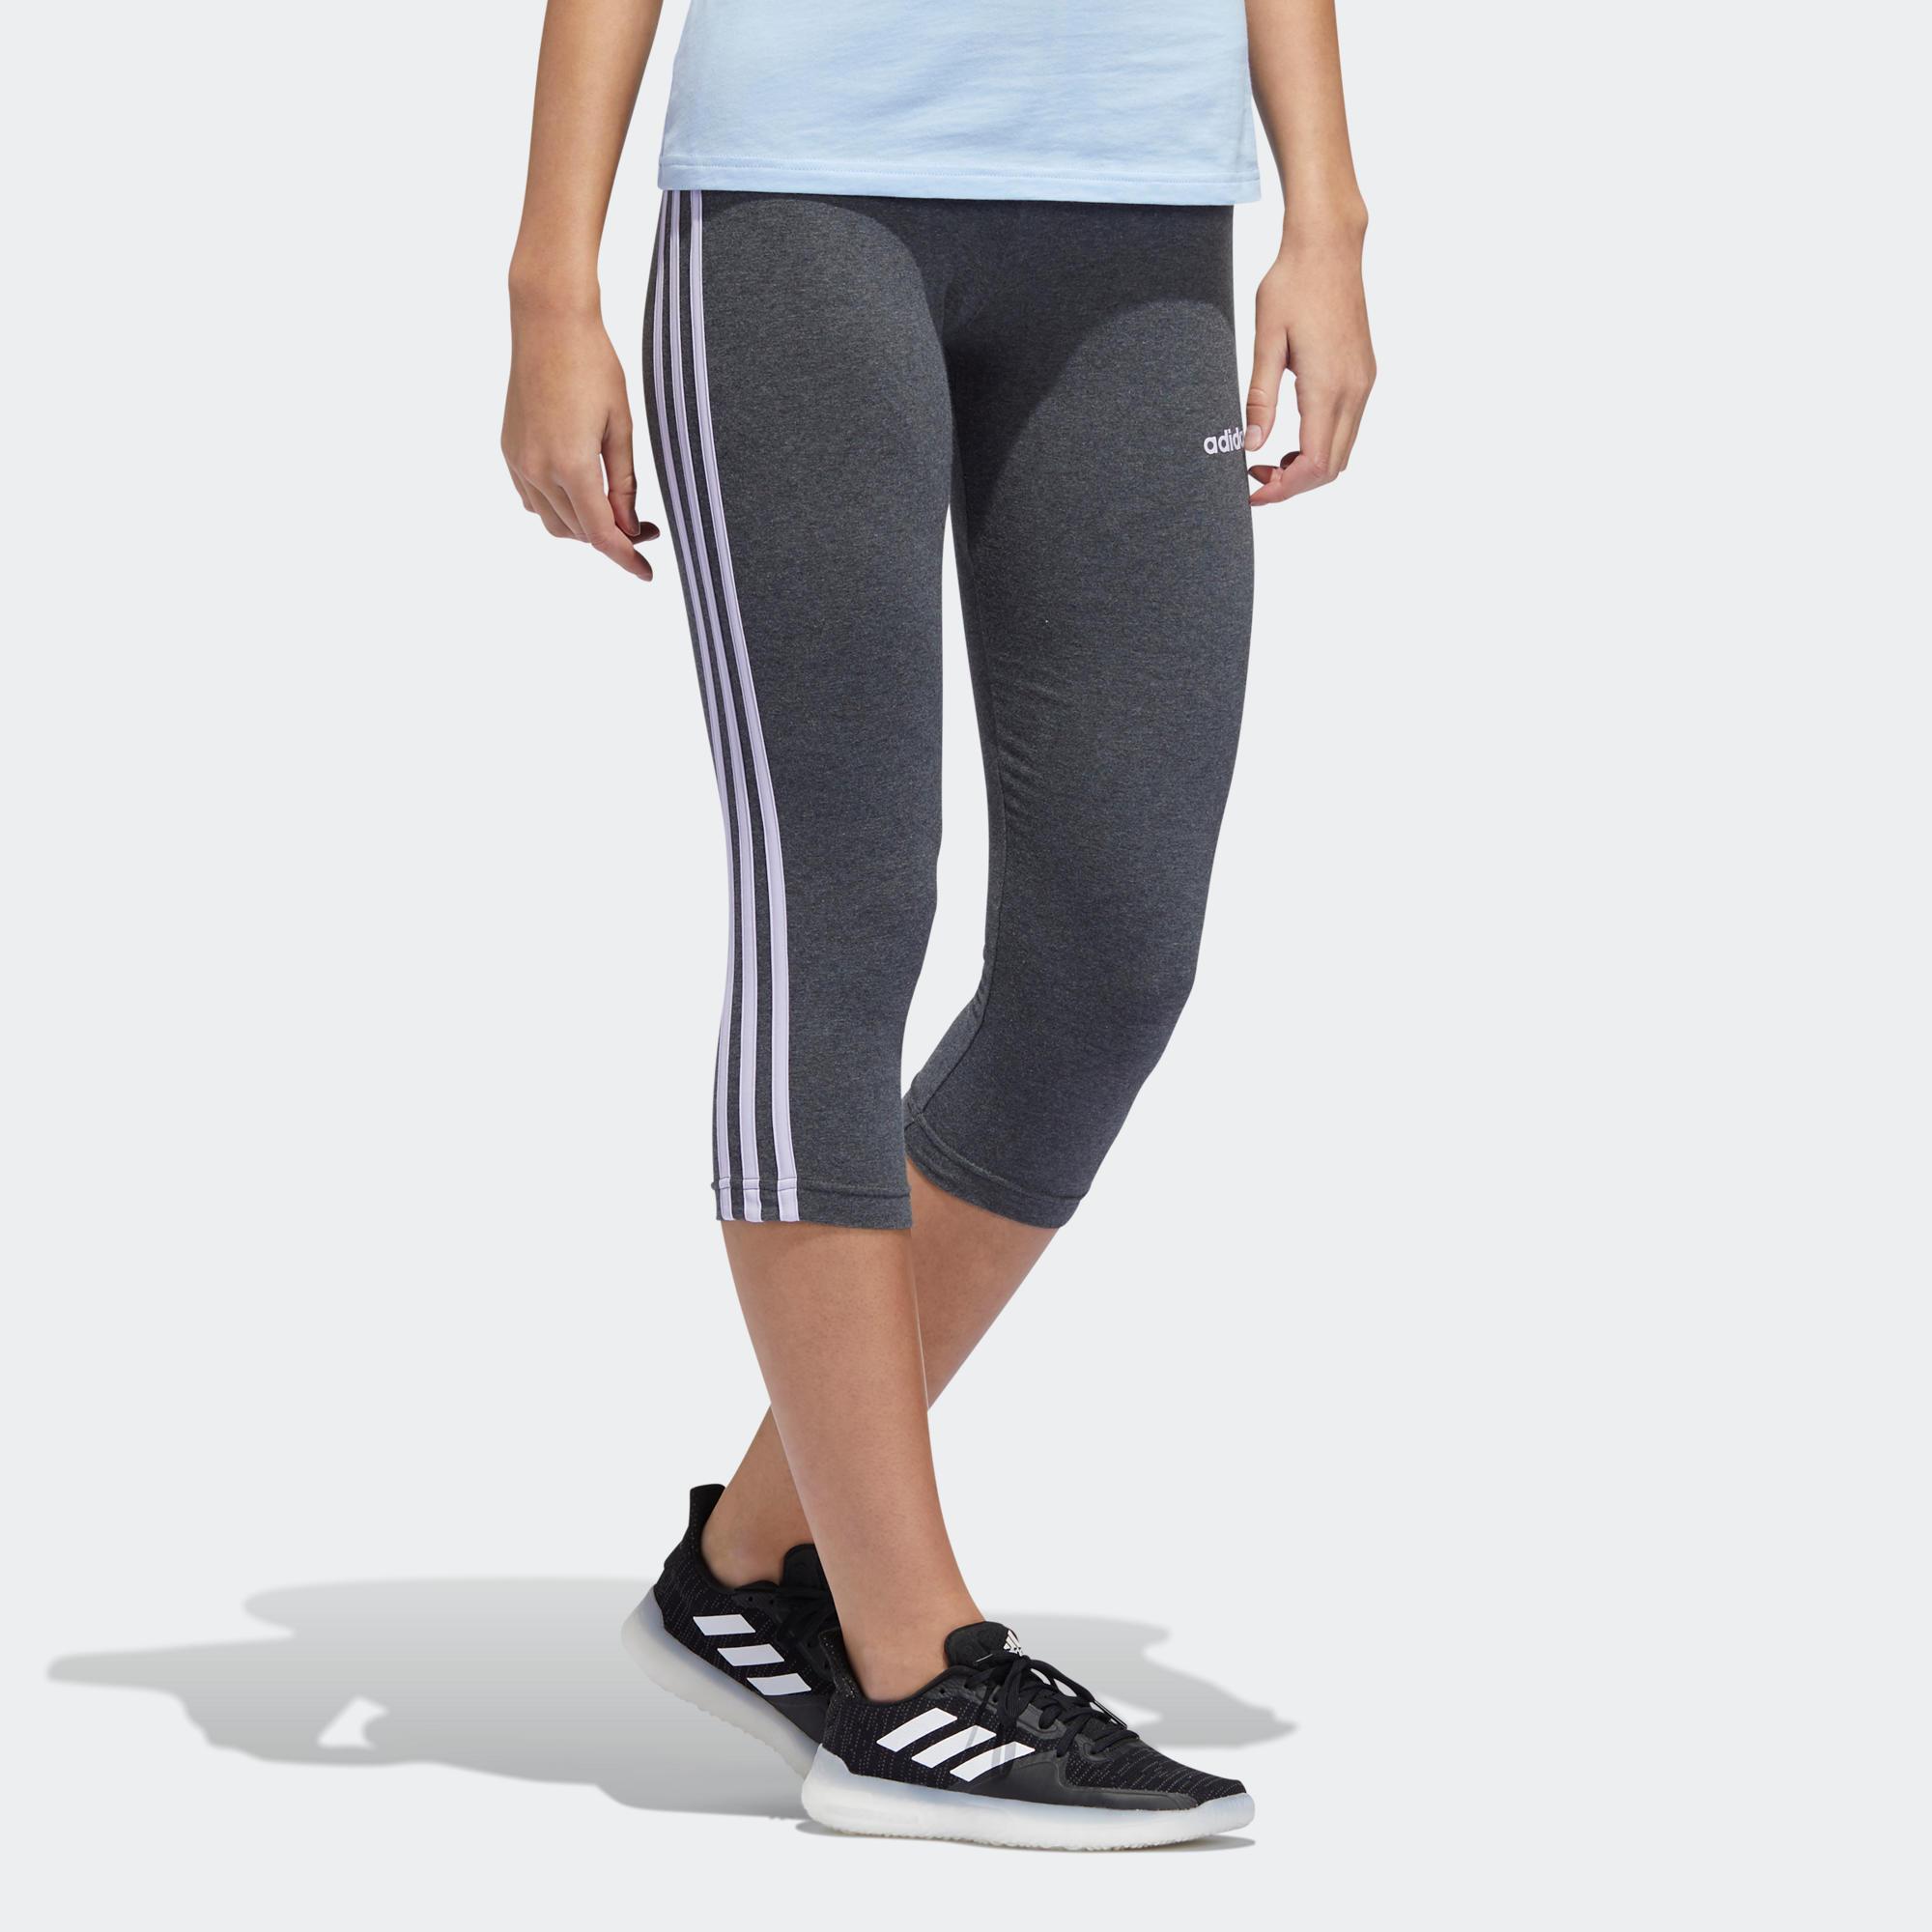 Colanți Adidas Damă imagine